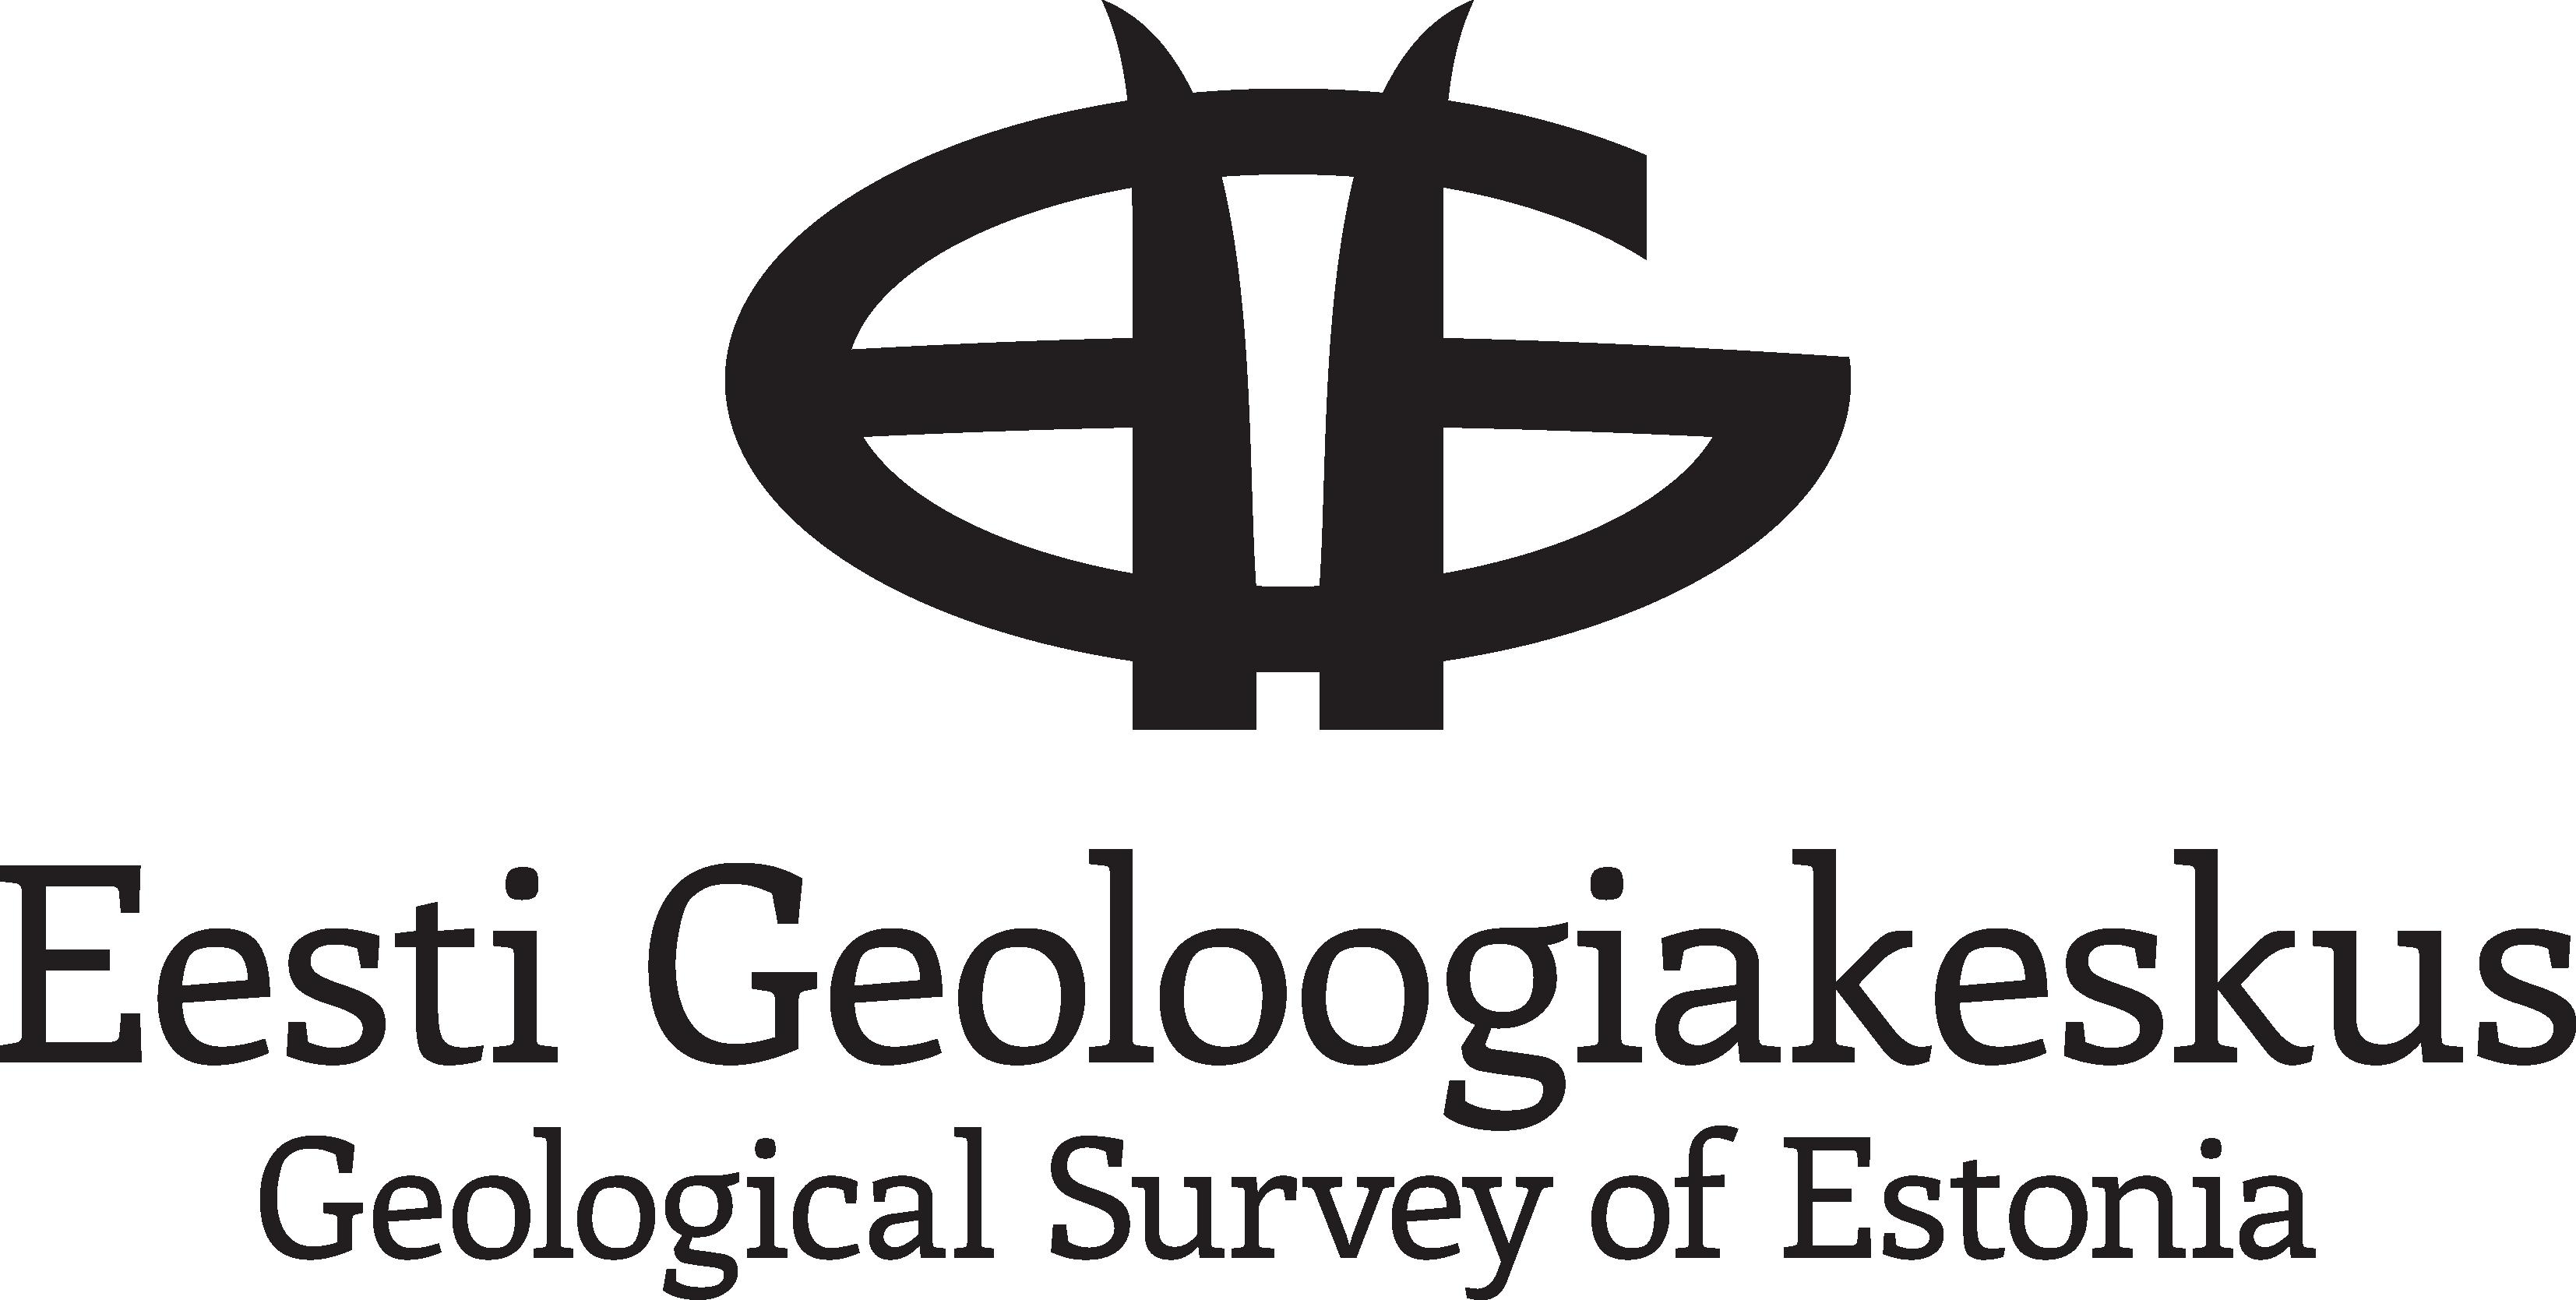 5. Geological Survey of Estonia